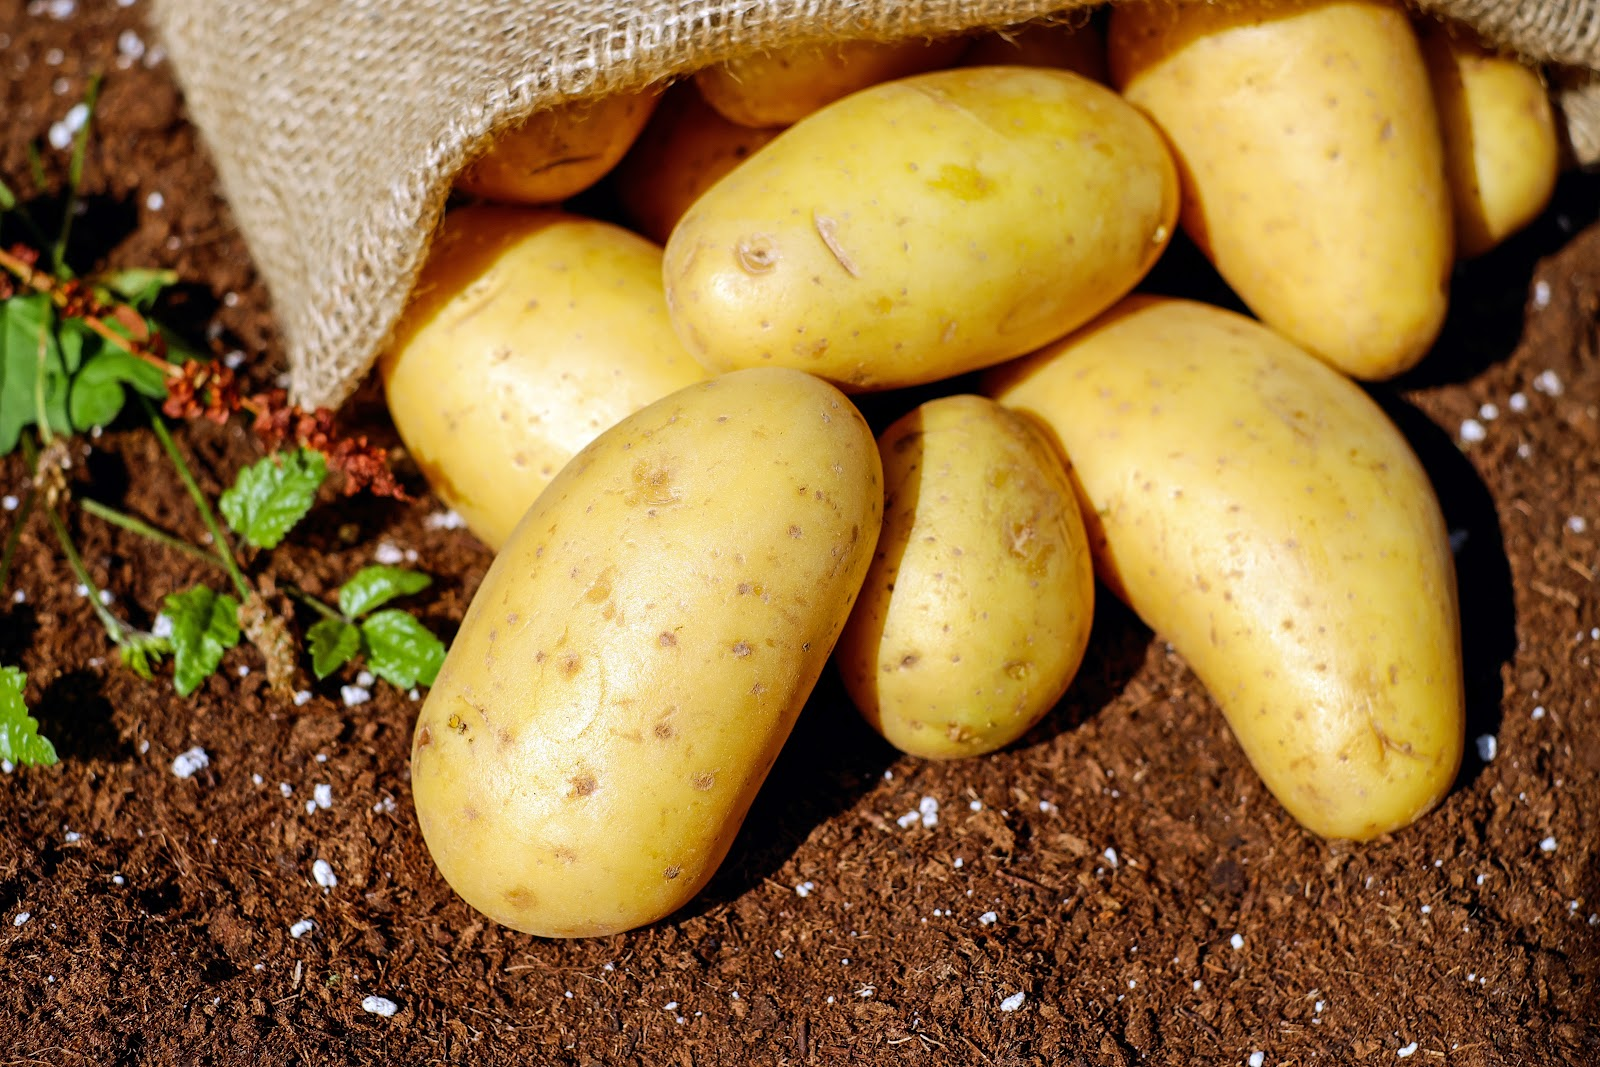 Sweet potatoes are good for eyesight